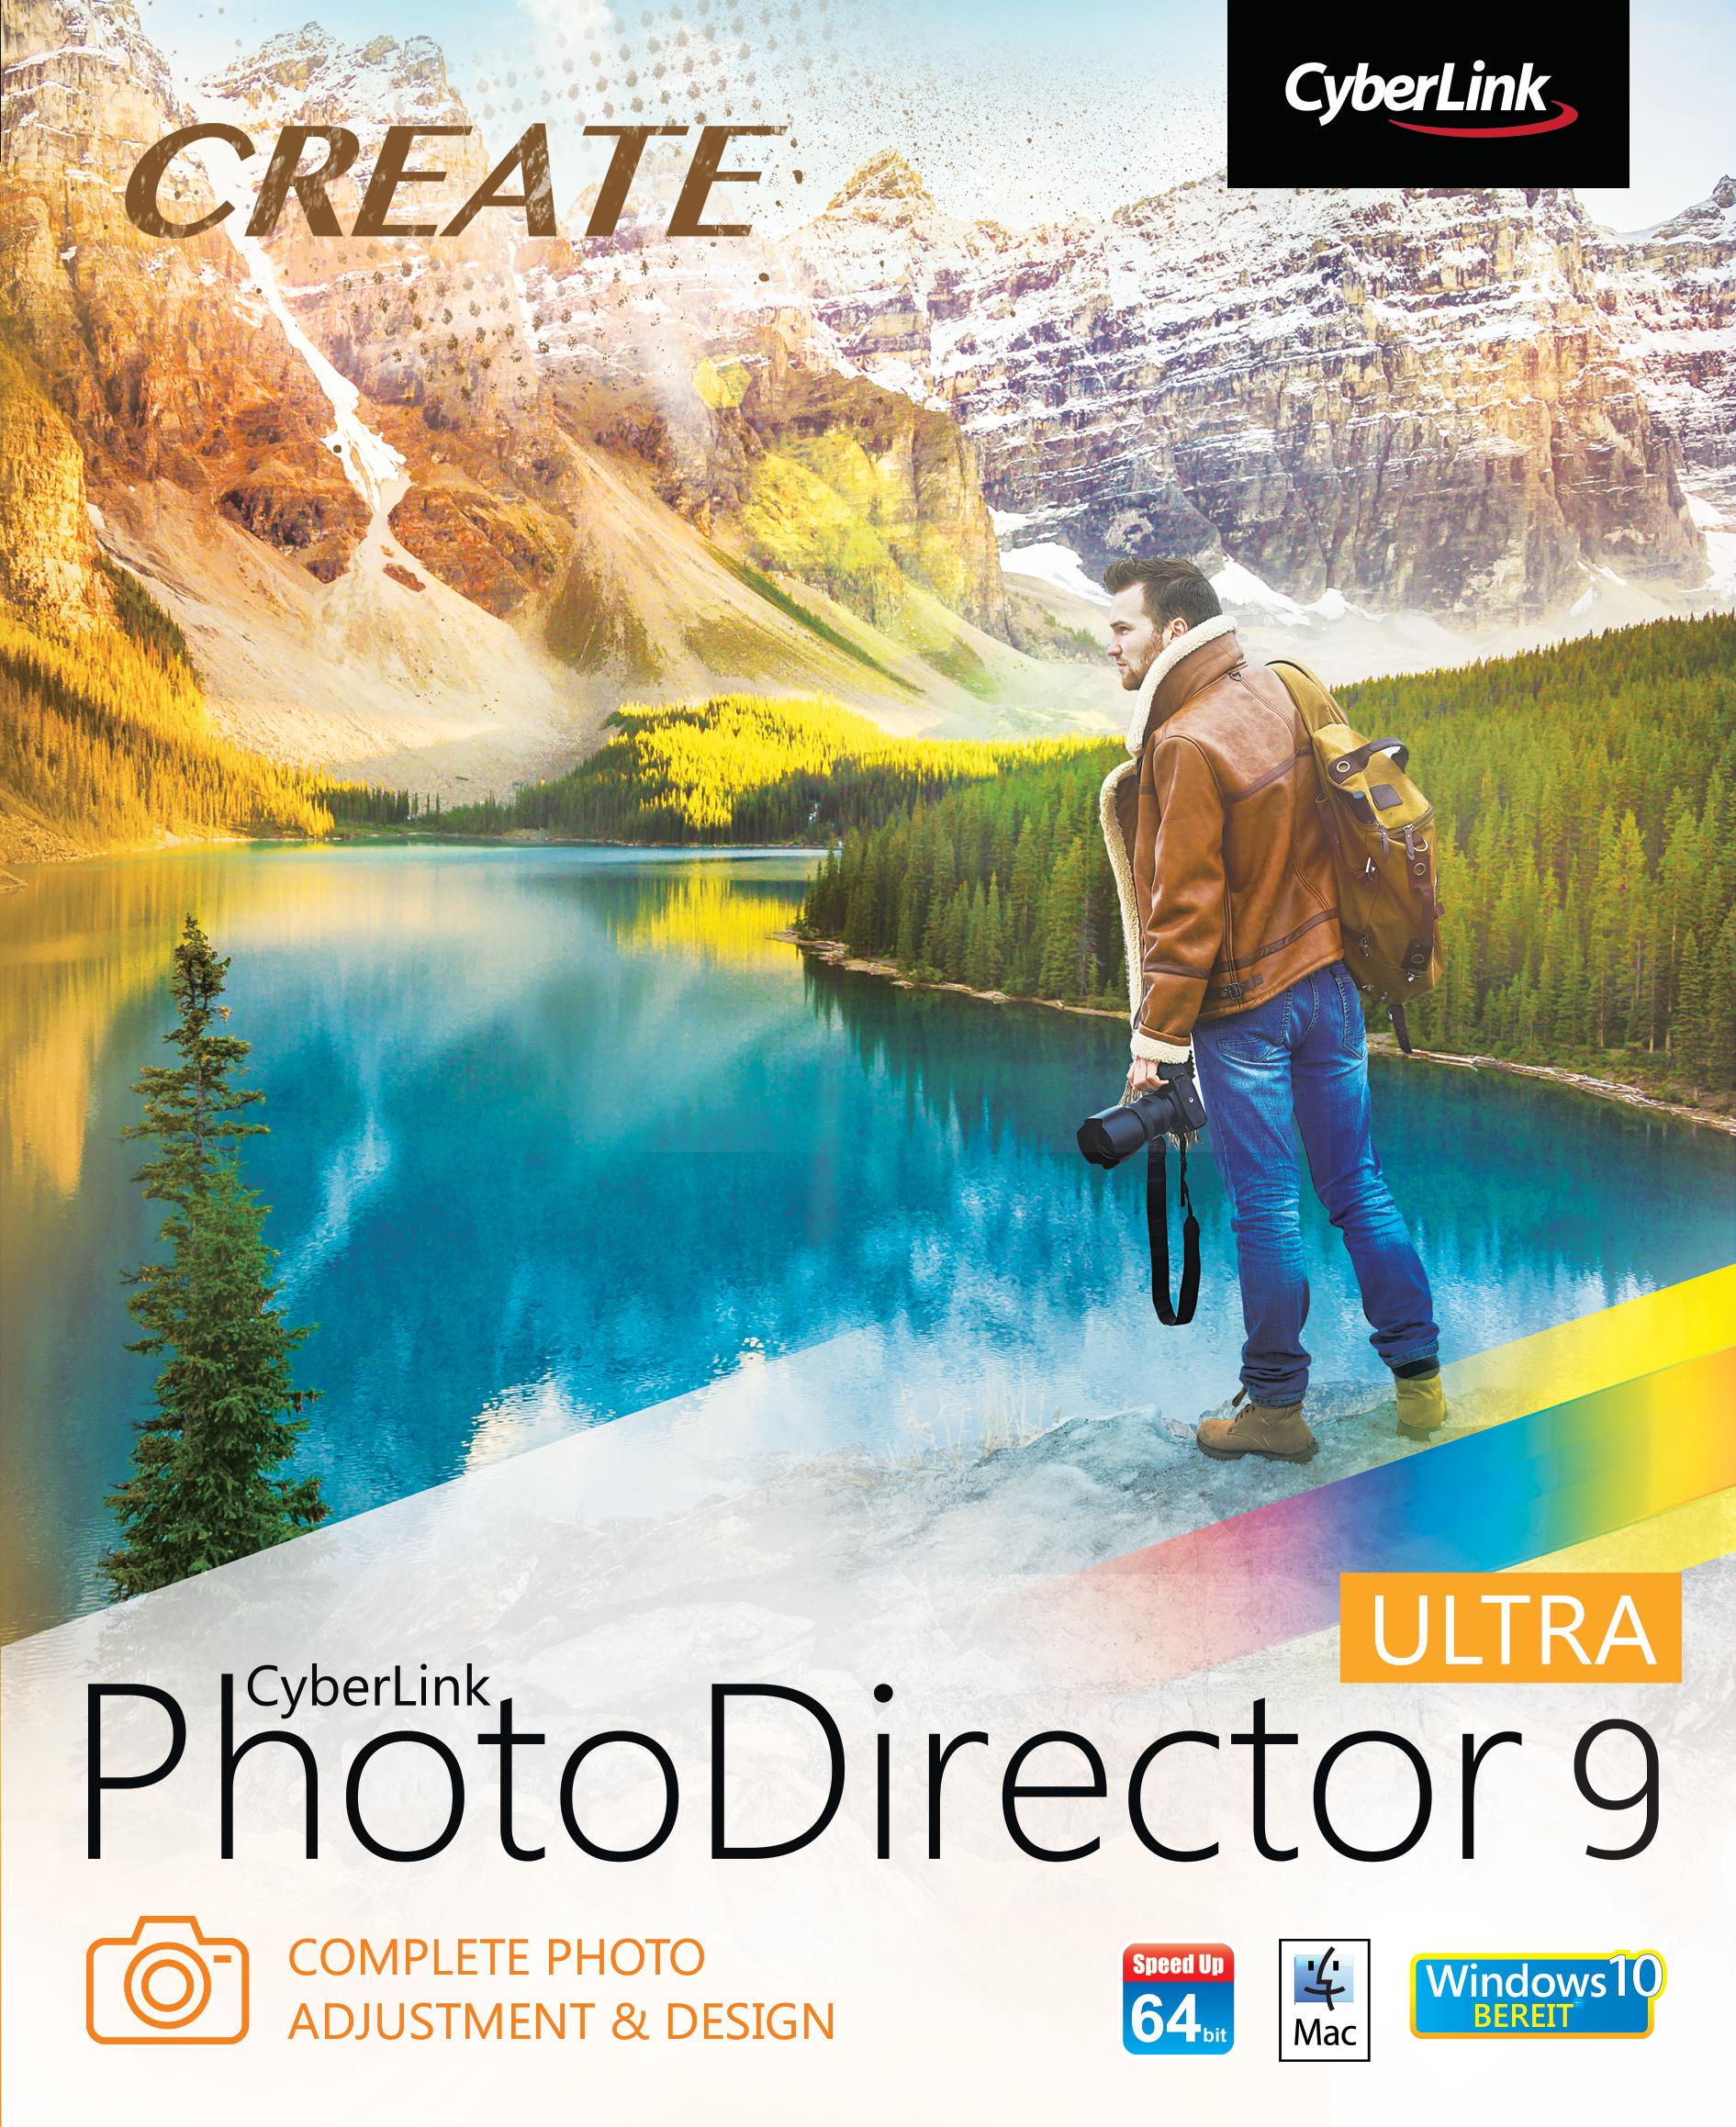 CyberLink PhotoDirector 9 Ultra (WIN) [Download]